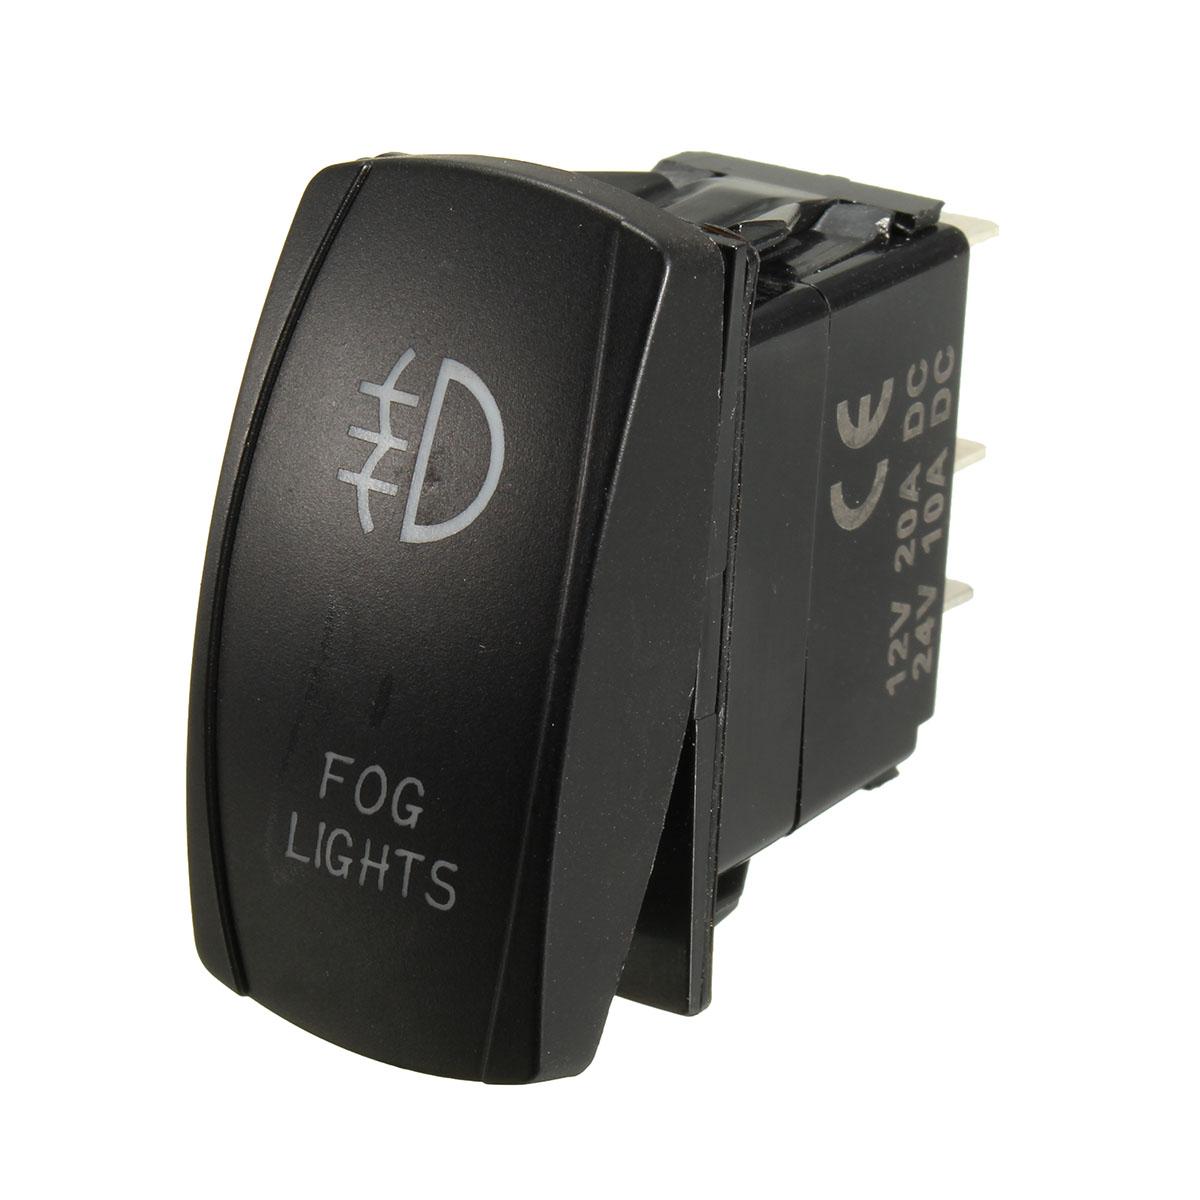 12v 40a Led Fog Light Wiring Harness Laser Rocker Switch Relay Fuse Lamp Wire Kits With Fit Kit 36c847e9 8cdc 42b5 B6a0 75e4da725576 Ea891649 64aa 4226 A525 1354a3726e61